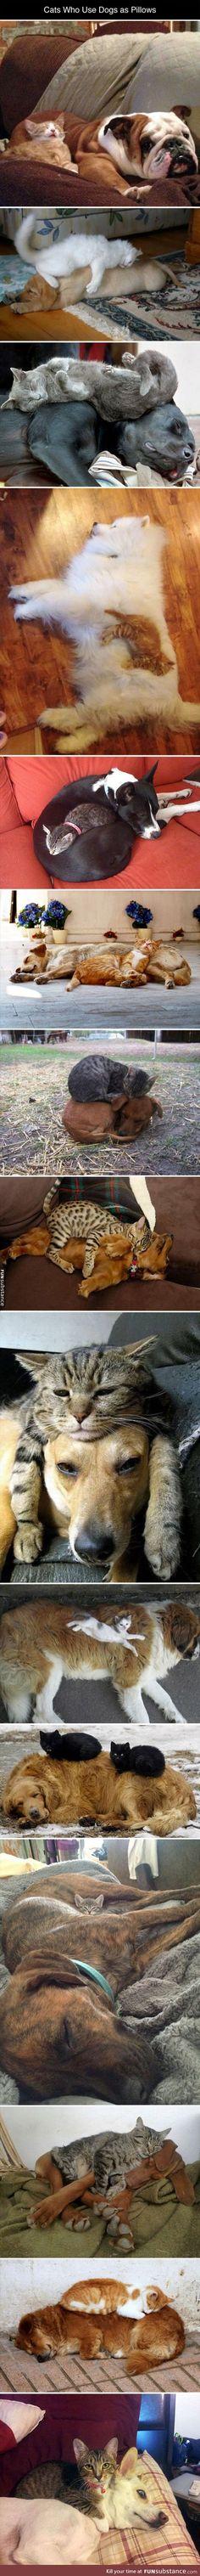 Dogs make nice pillows